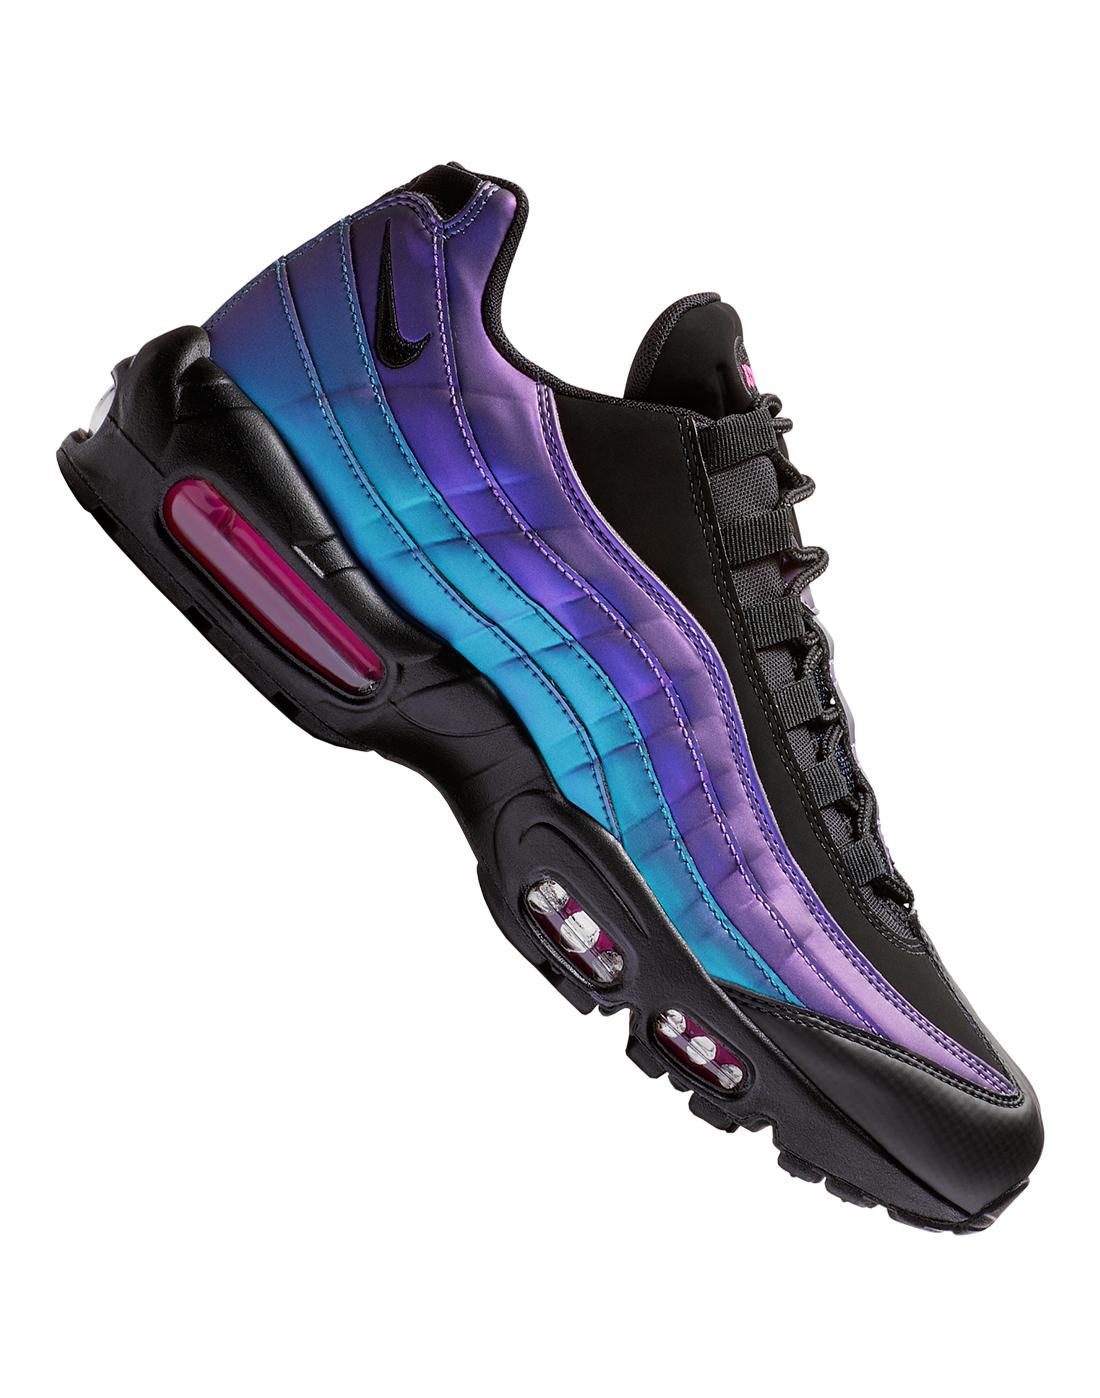 d0f75f3309788 Men's Black & Blue Metallic Nike Air Max 95 | Life Style Sports